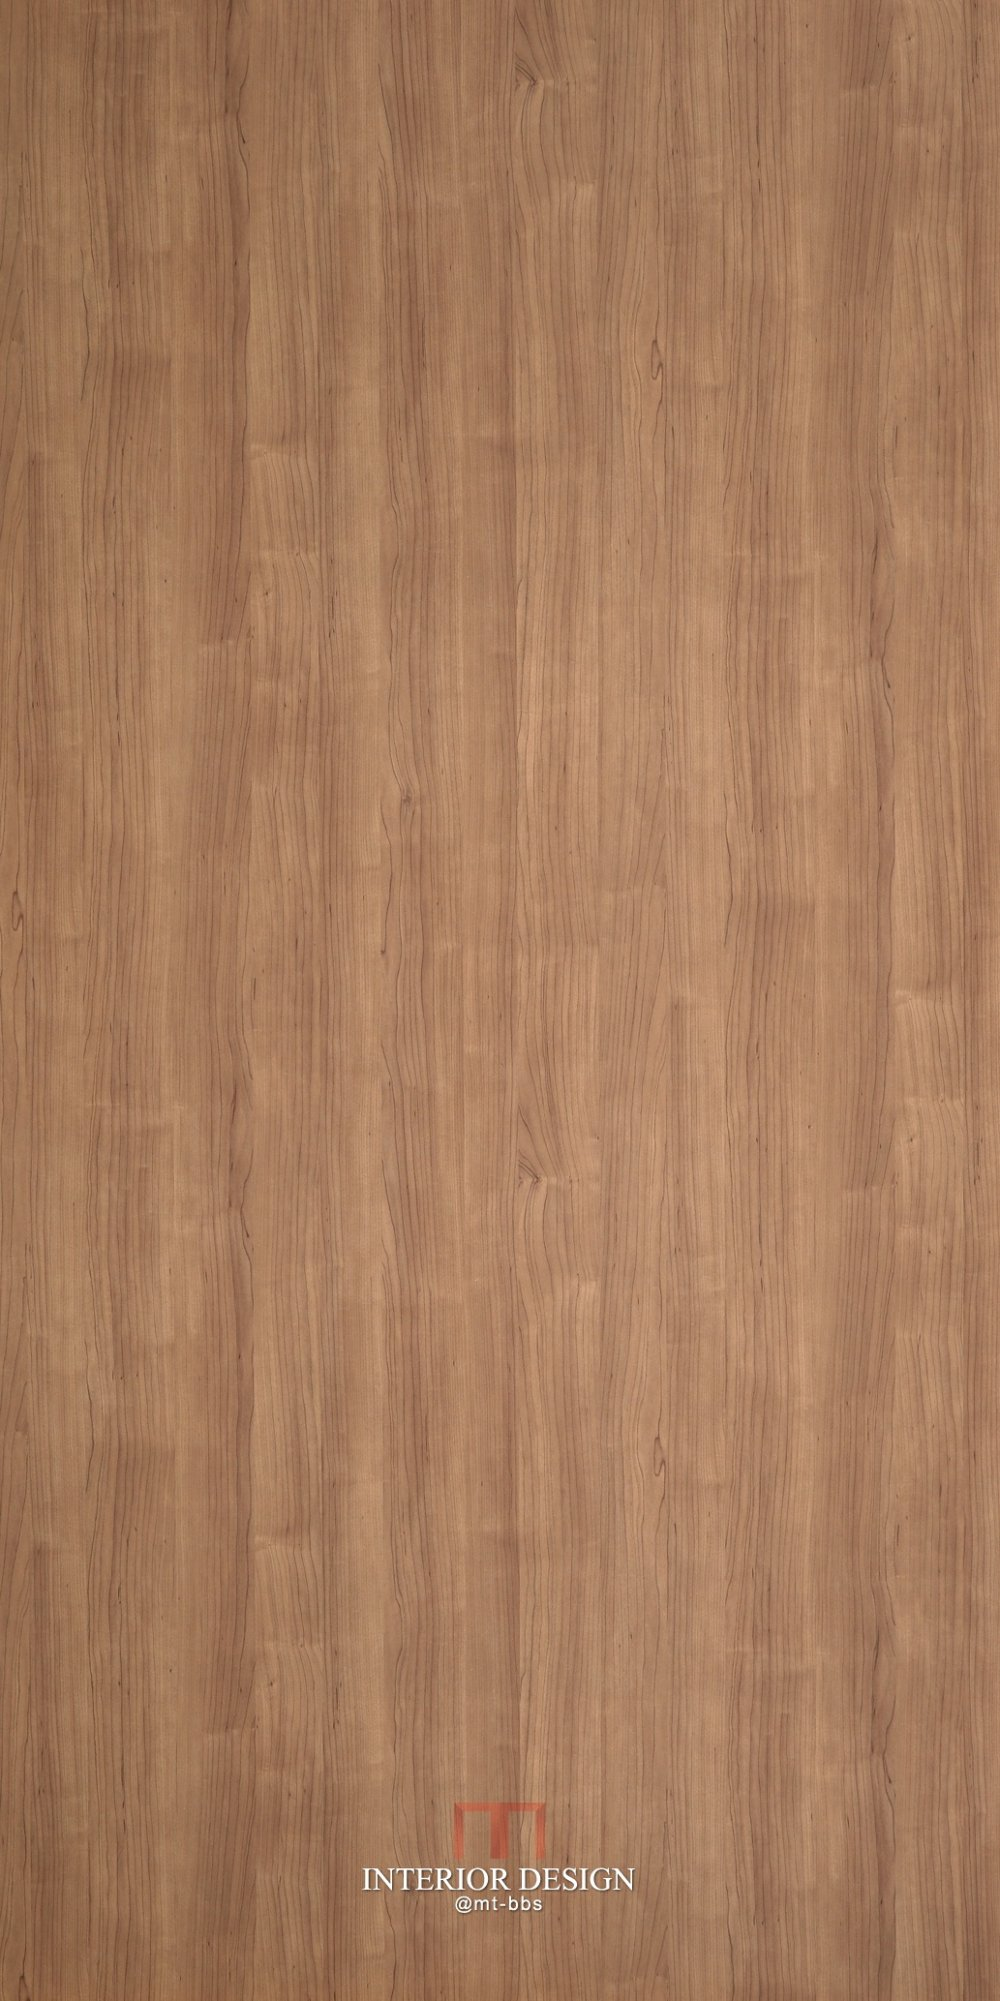 5485WB - Spice Maple (in 4\\\' x 8\\\').jpg